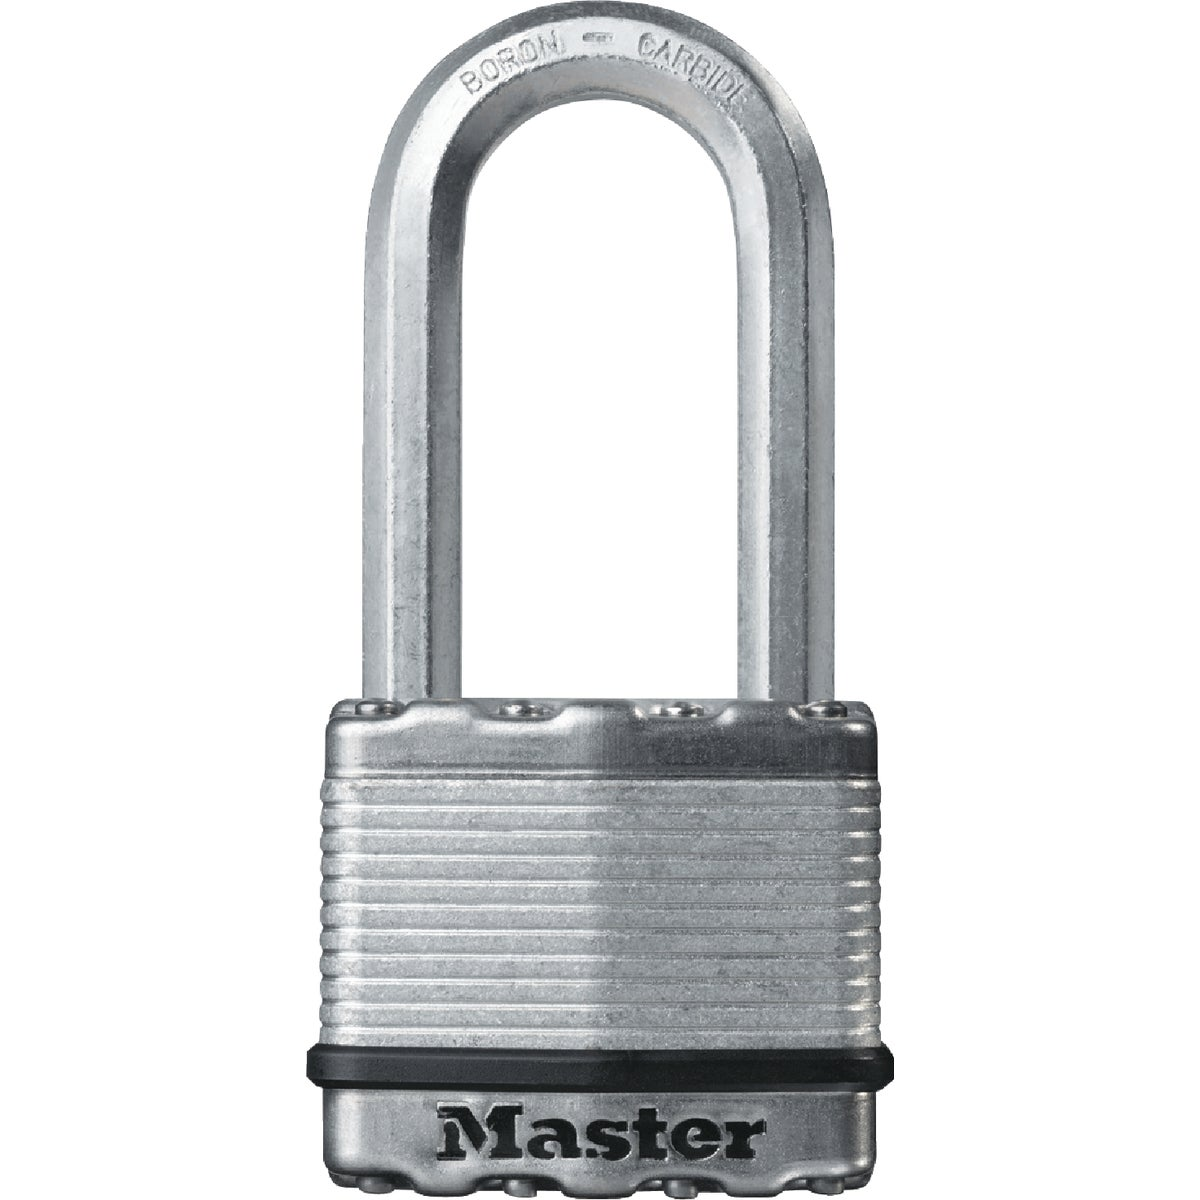 "2"" MAG LNG SHKLE PADLOCK - M5XKADLH by Master Lock Company"